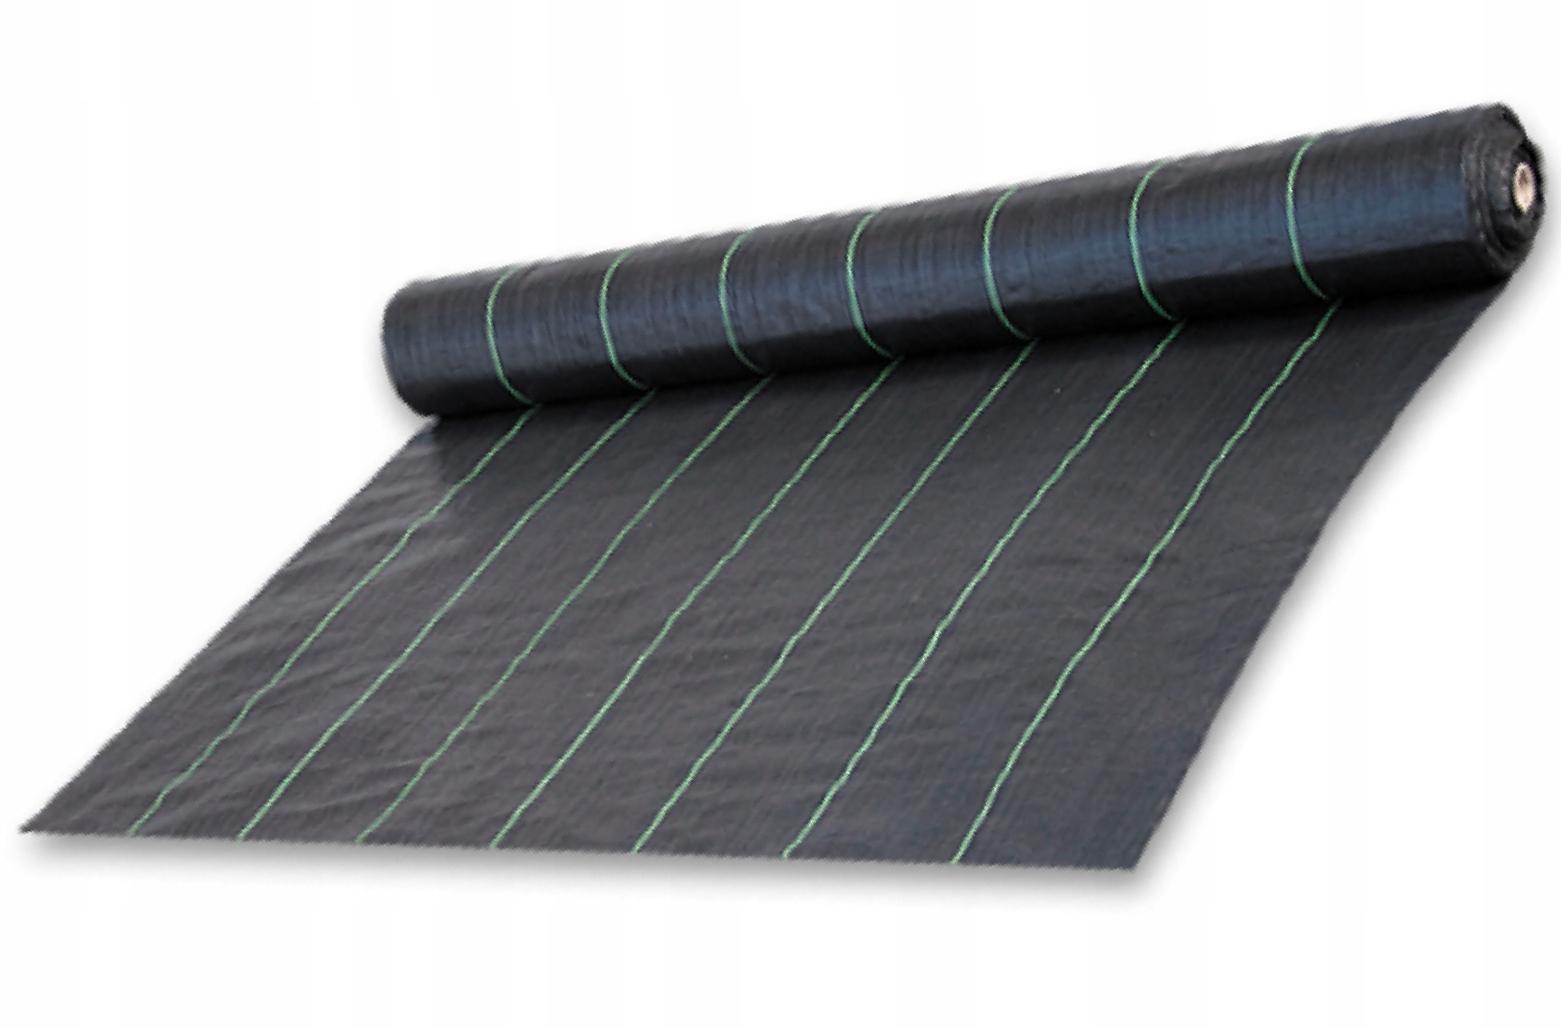 Agrotkanina antychwastowa czarna UV, 70g, 1,1 x 1m